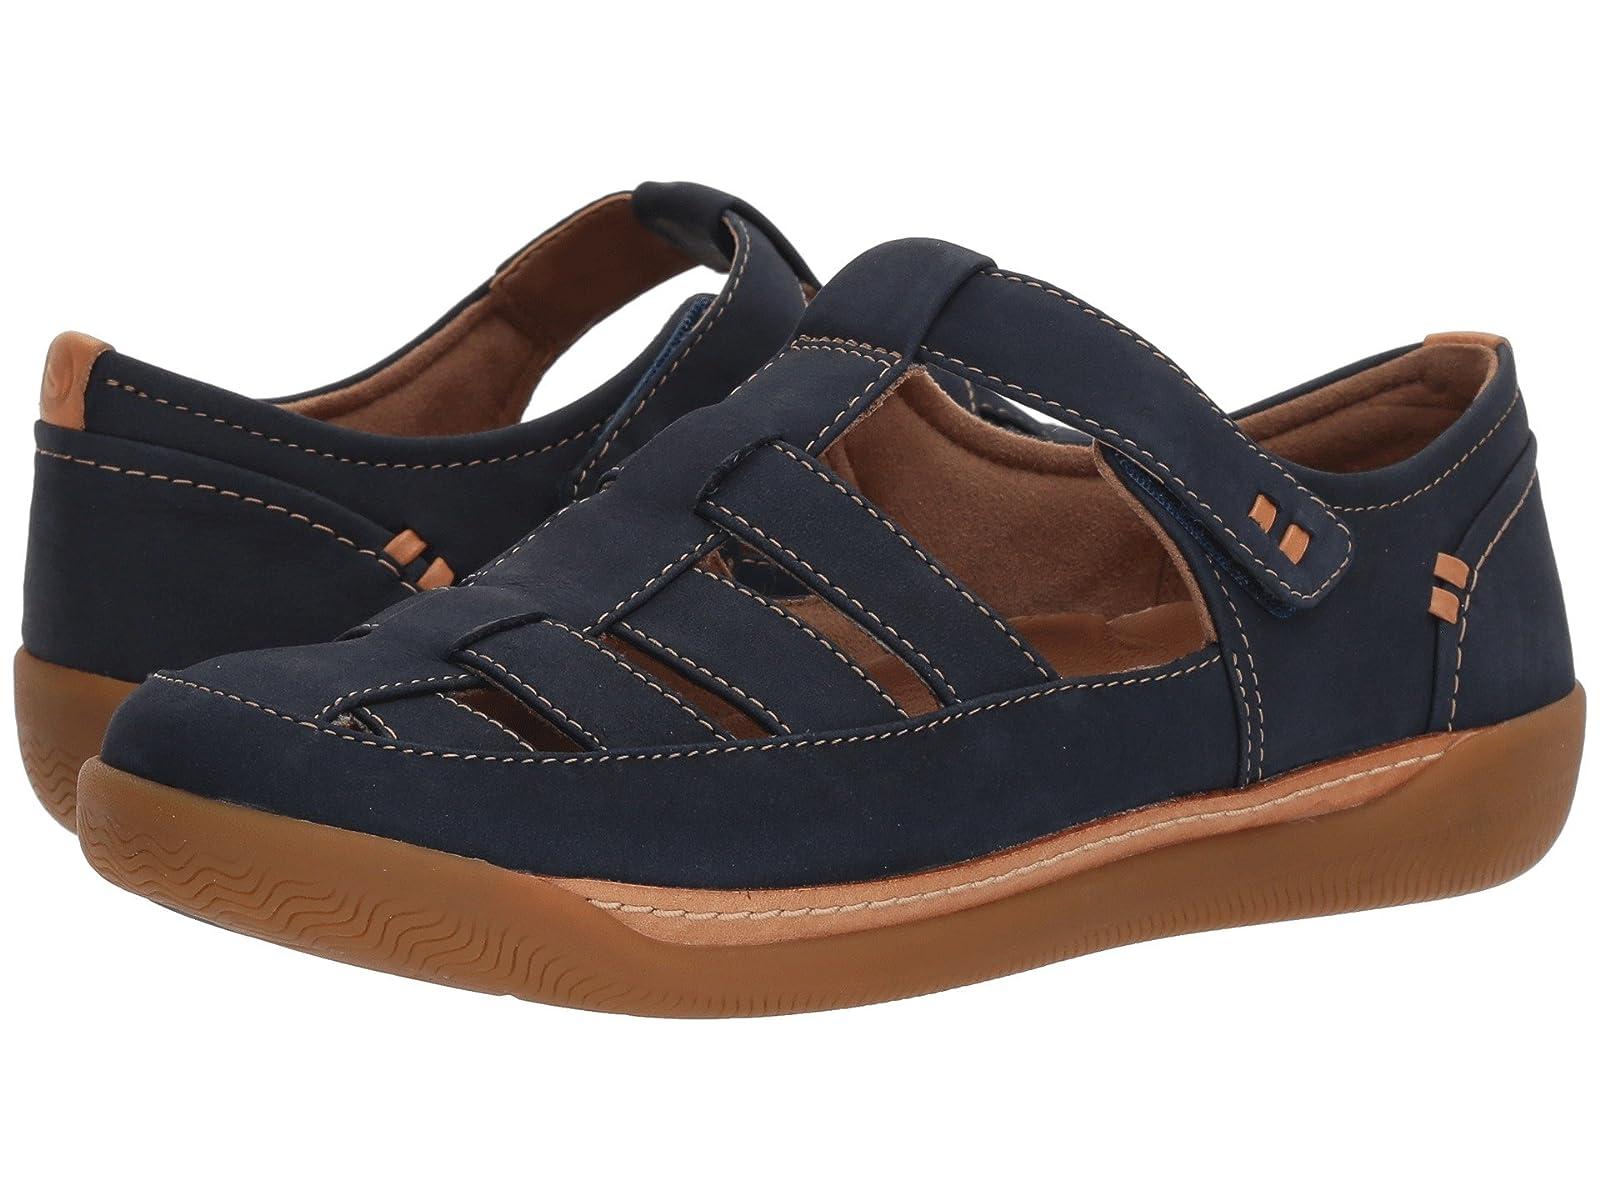 Clarks Un Haven CoveComfortable and distinctive shoes